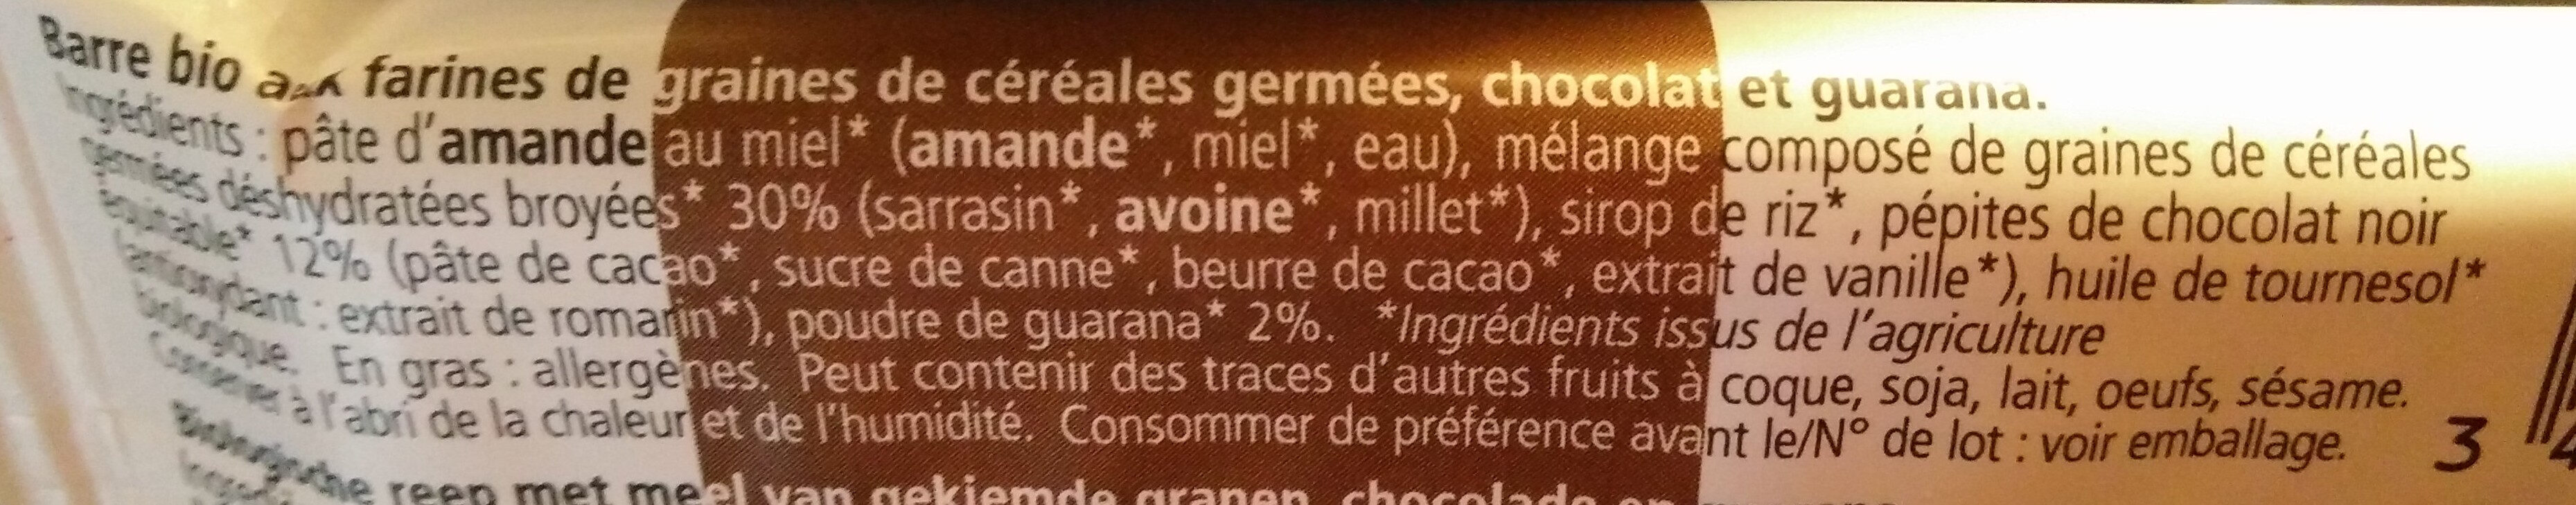 Barre Bio My Super Food Veggie chocolat guarana - Ingrediënten - fr